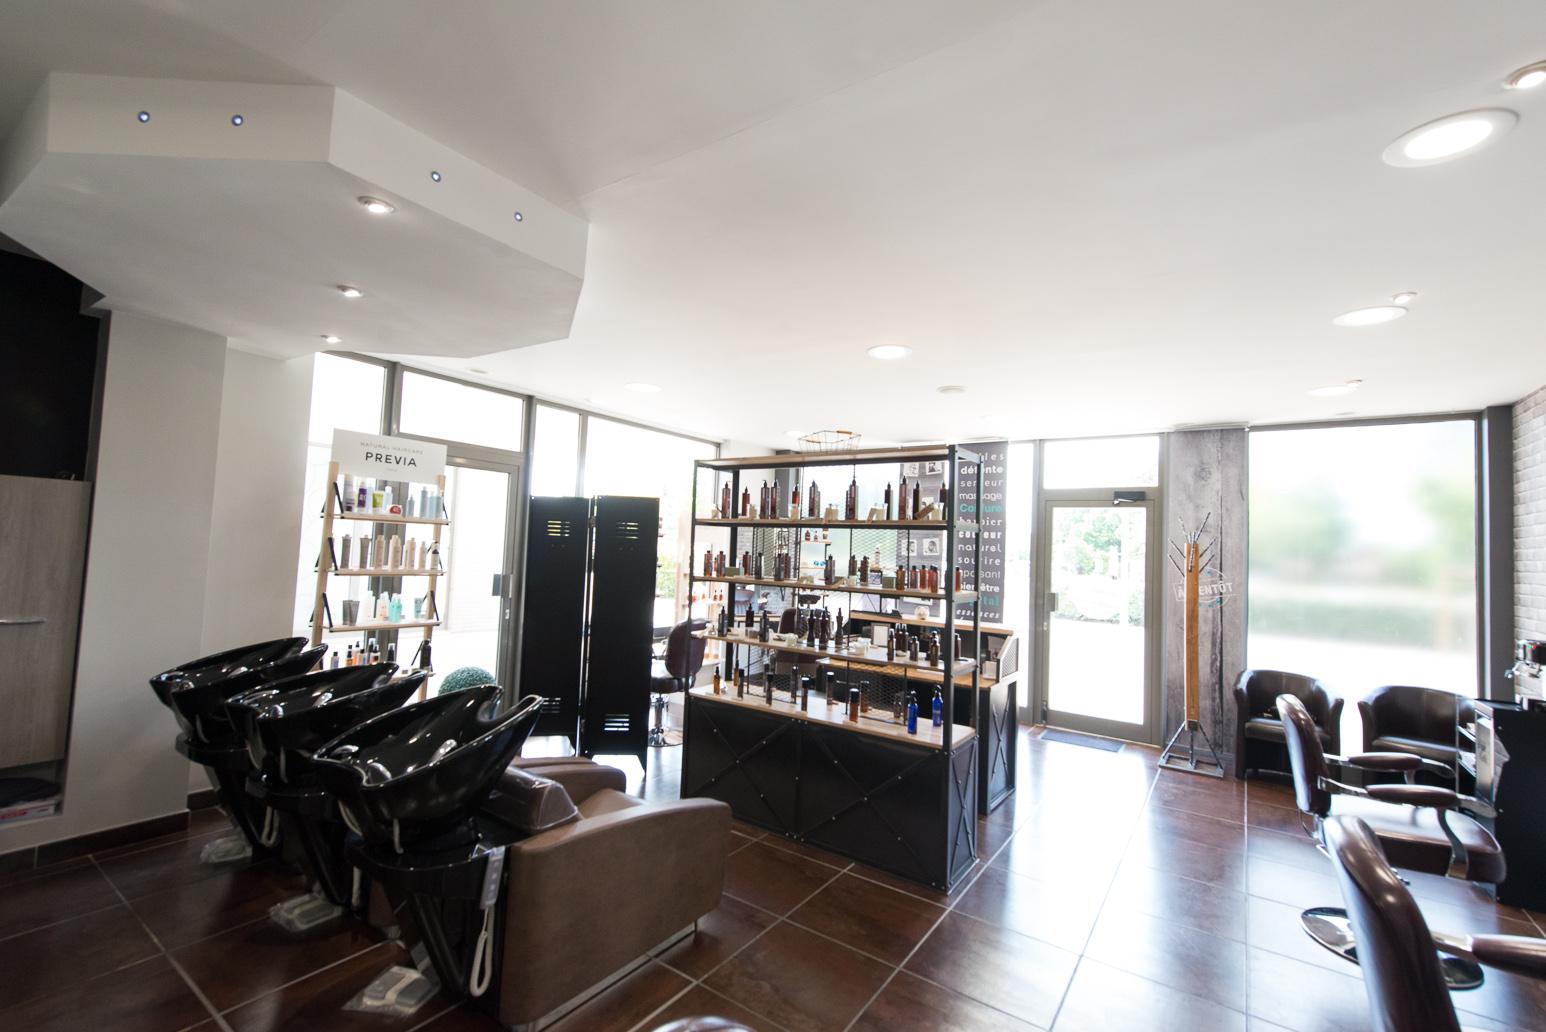 Salon de coiffure Avignon Agroparc